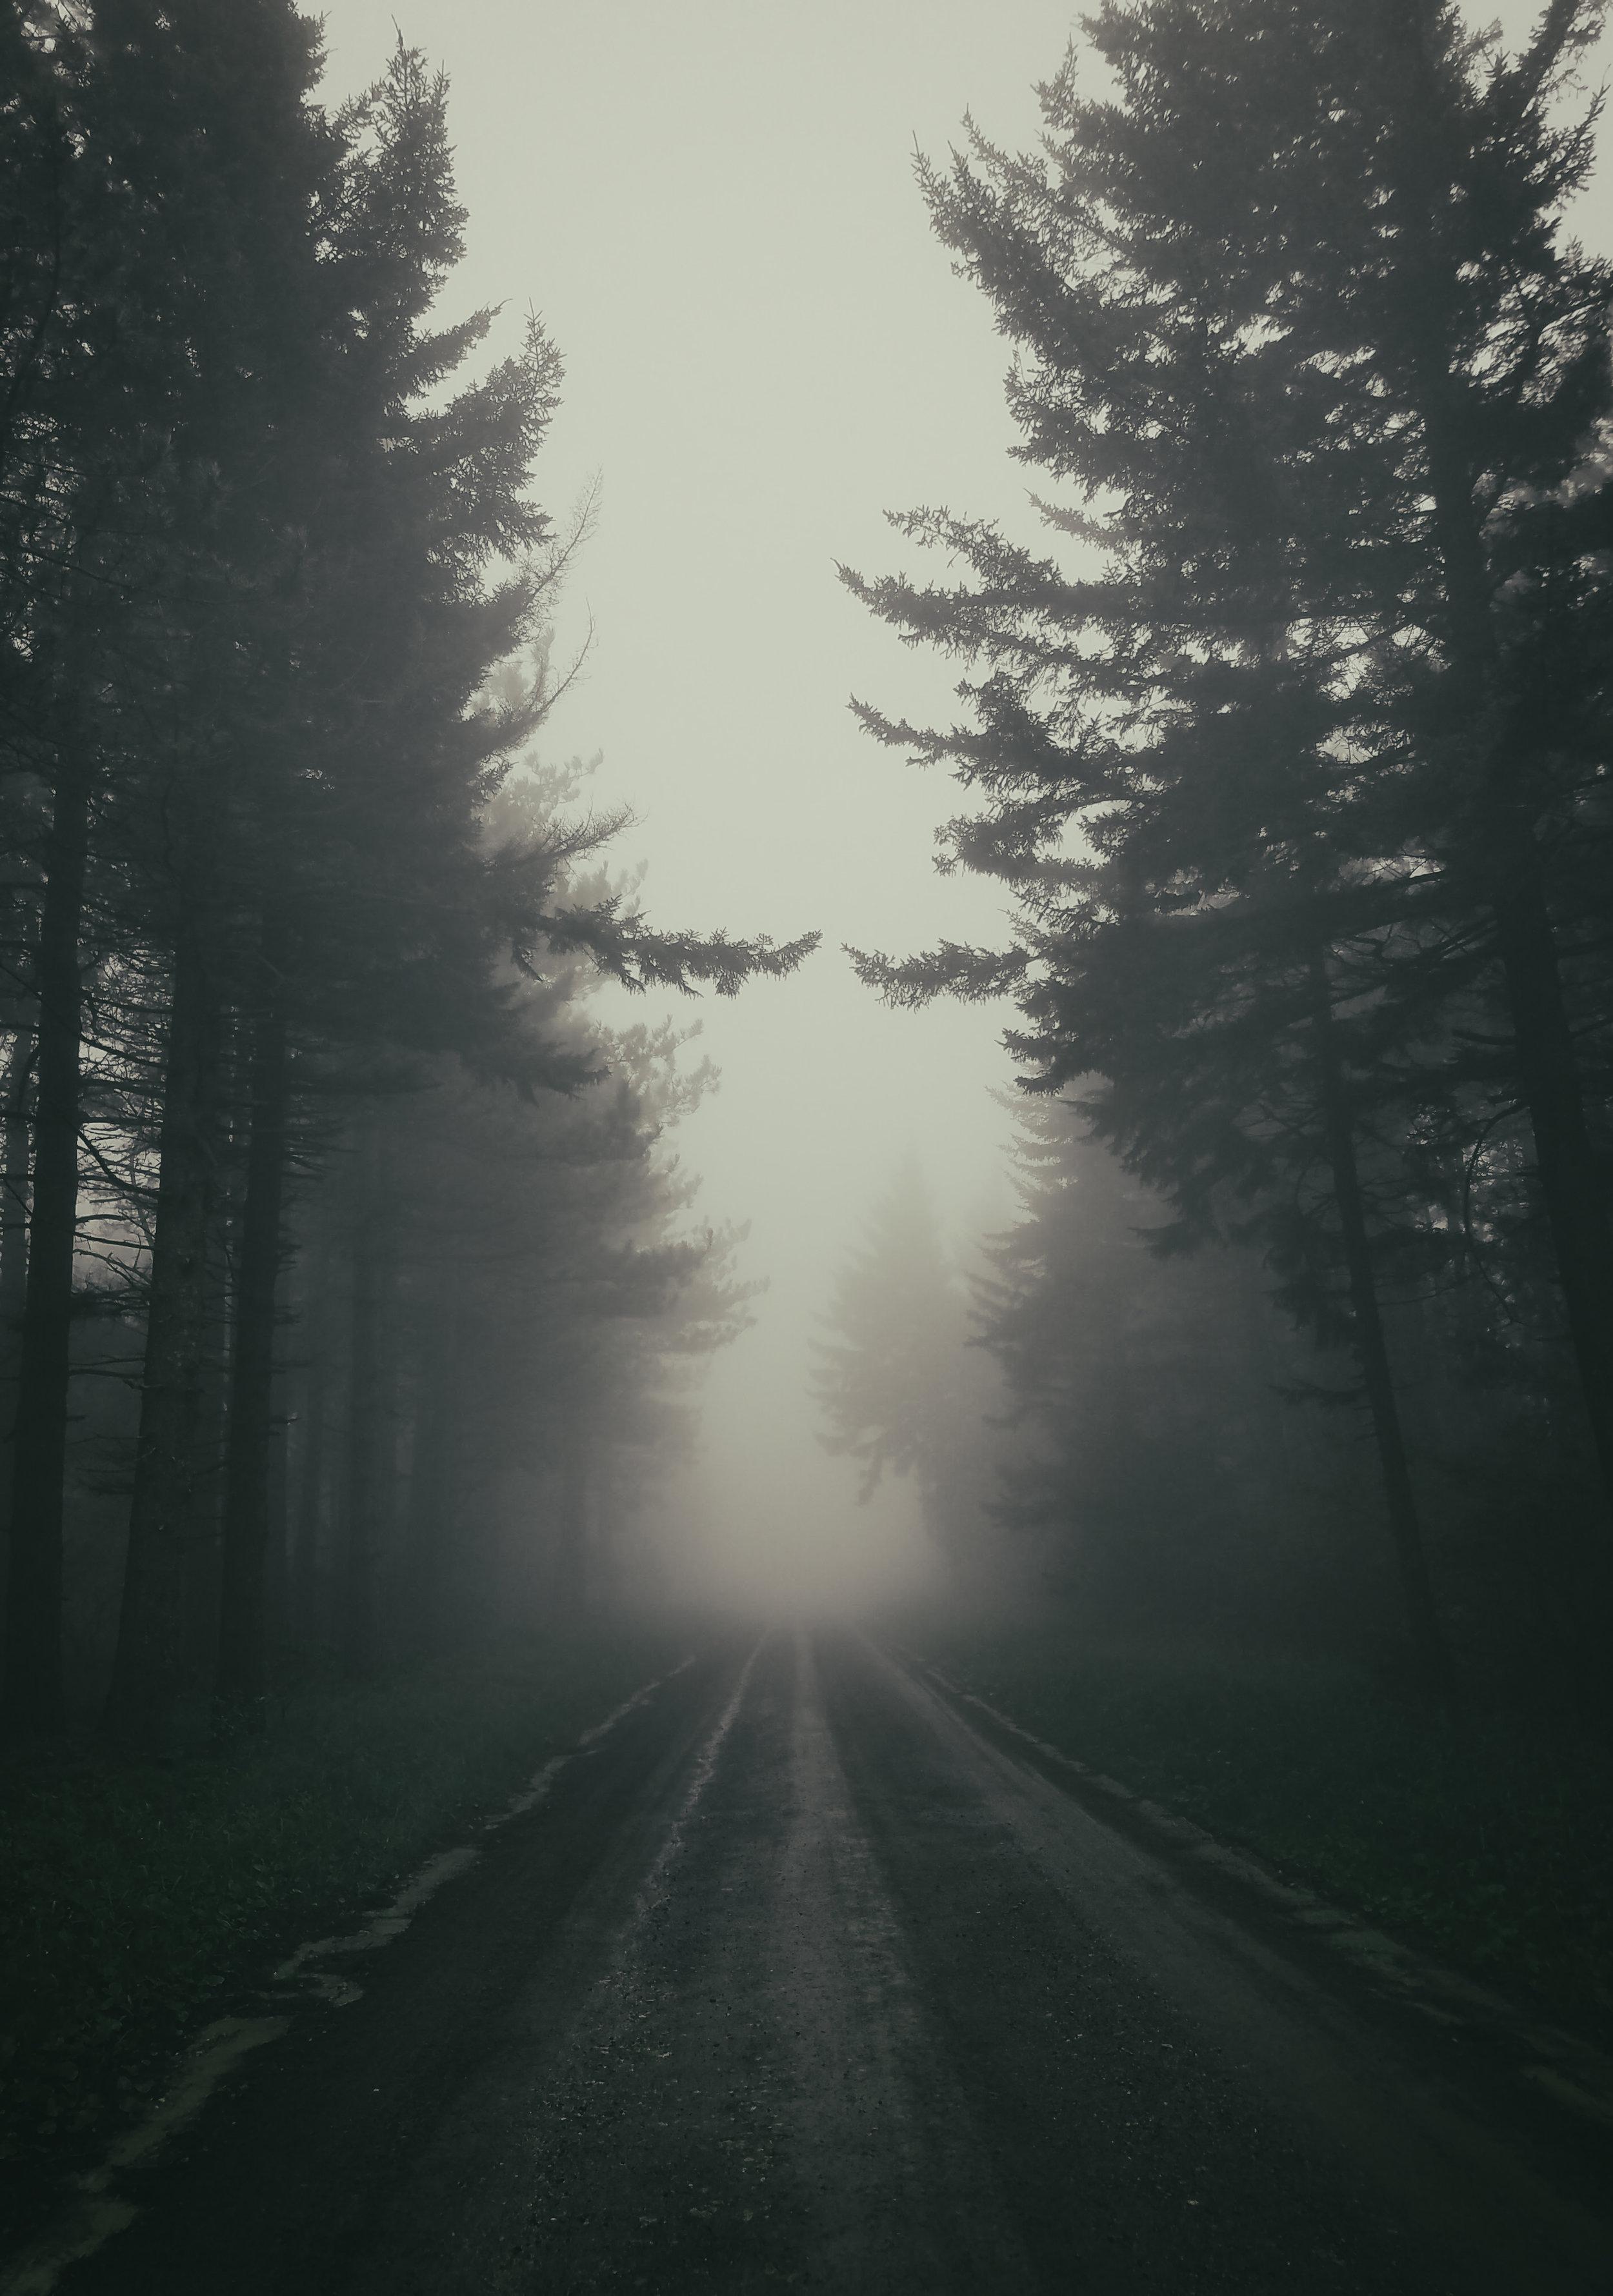 Nature_Tree_Landcp009.jpg